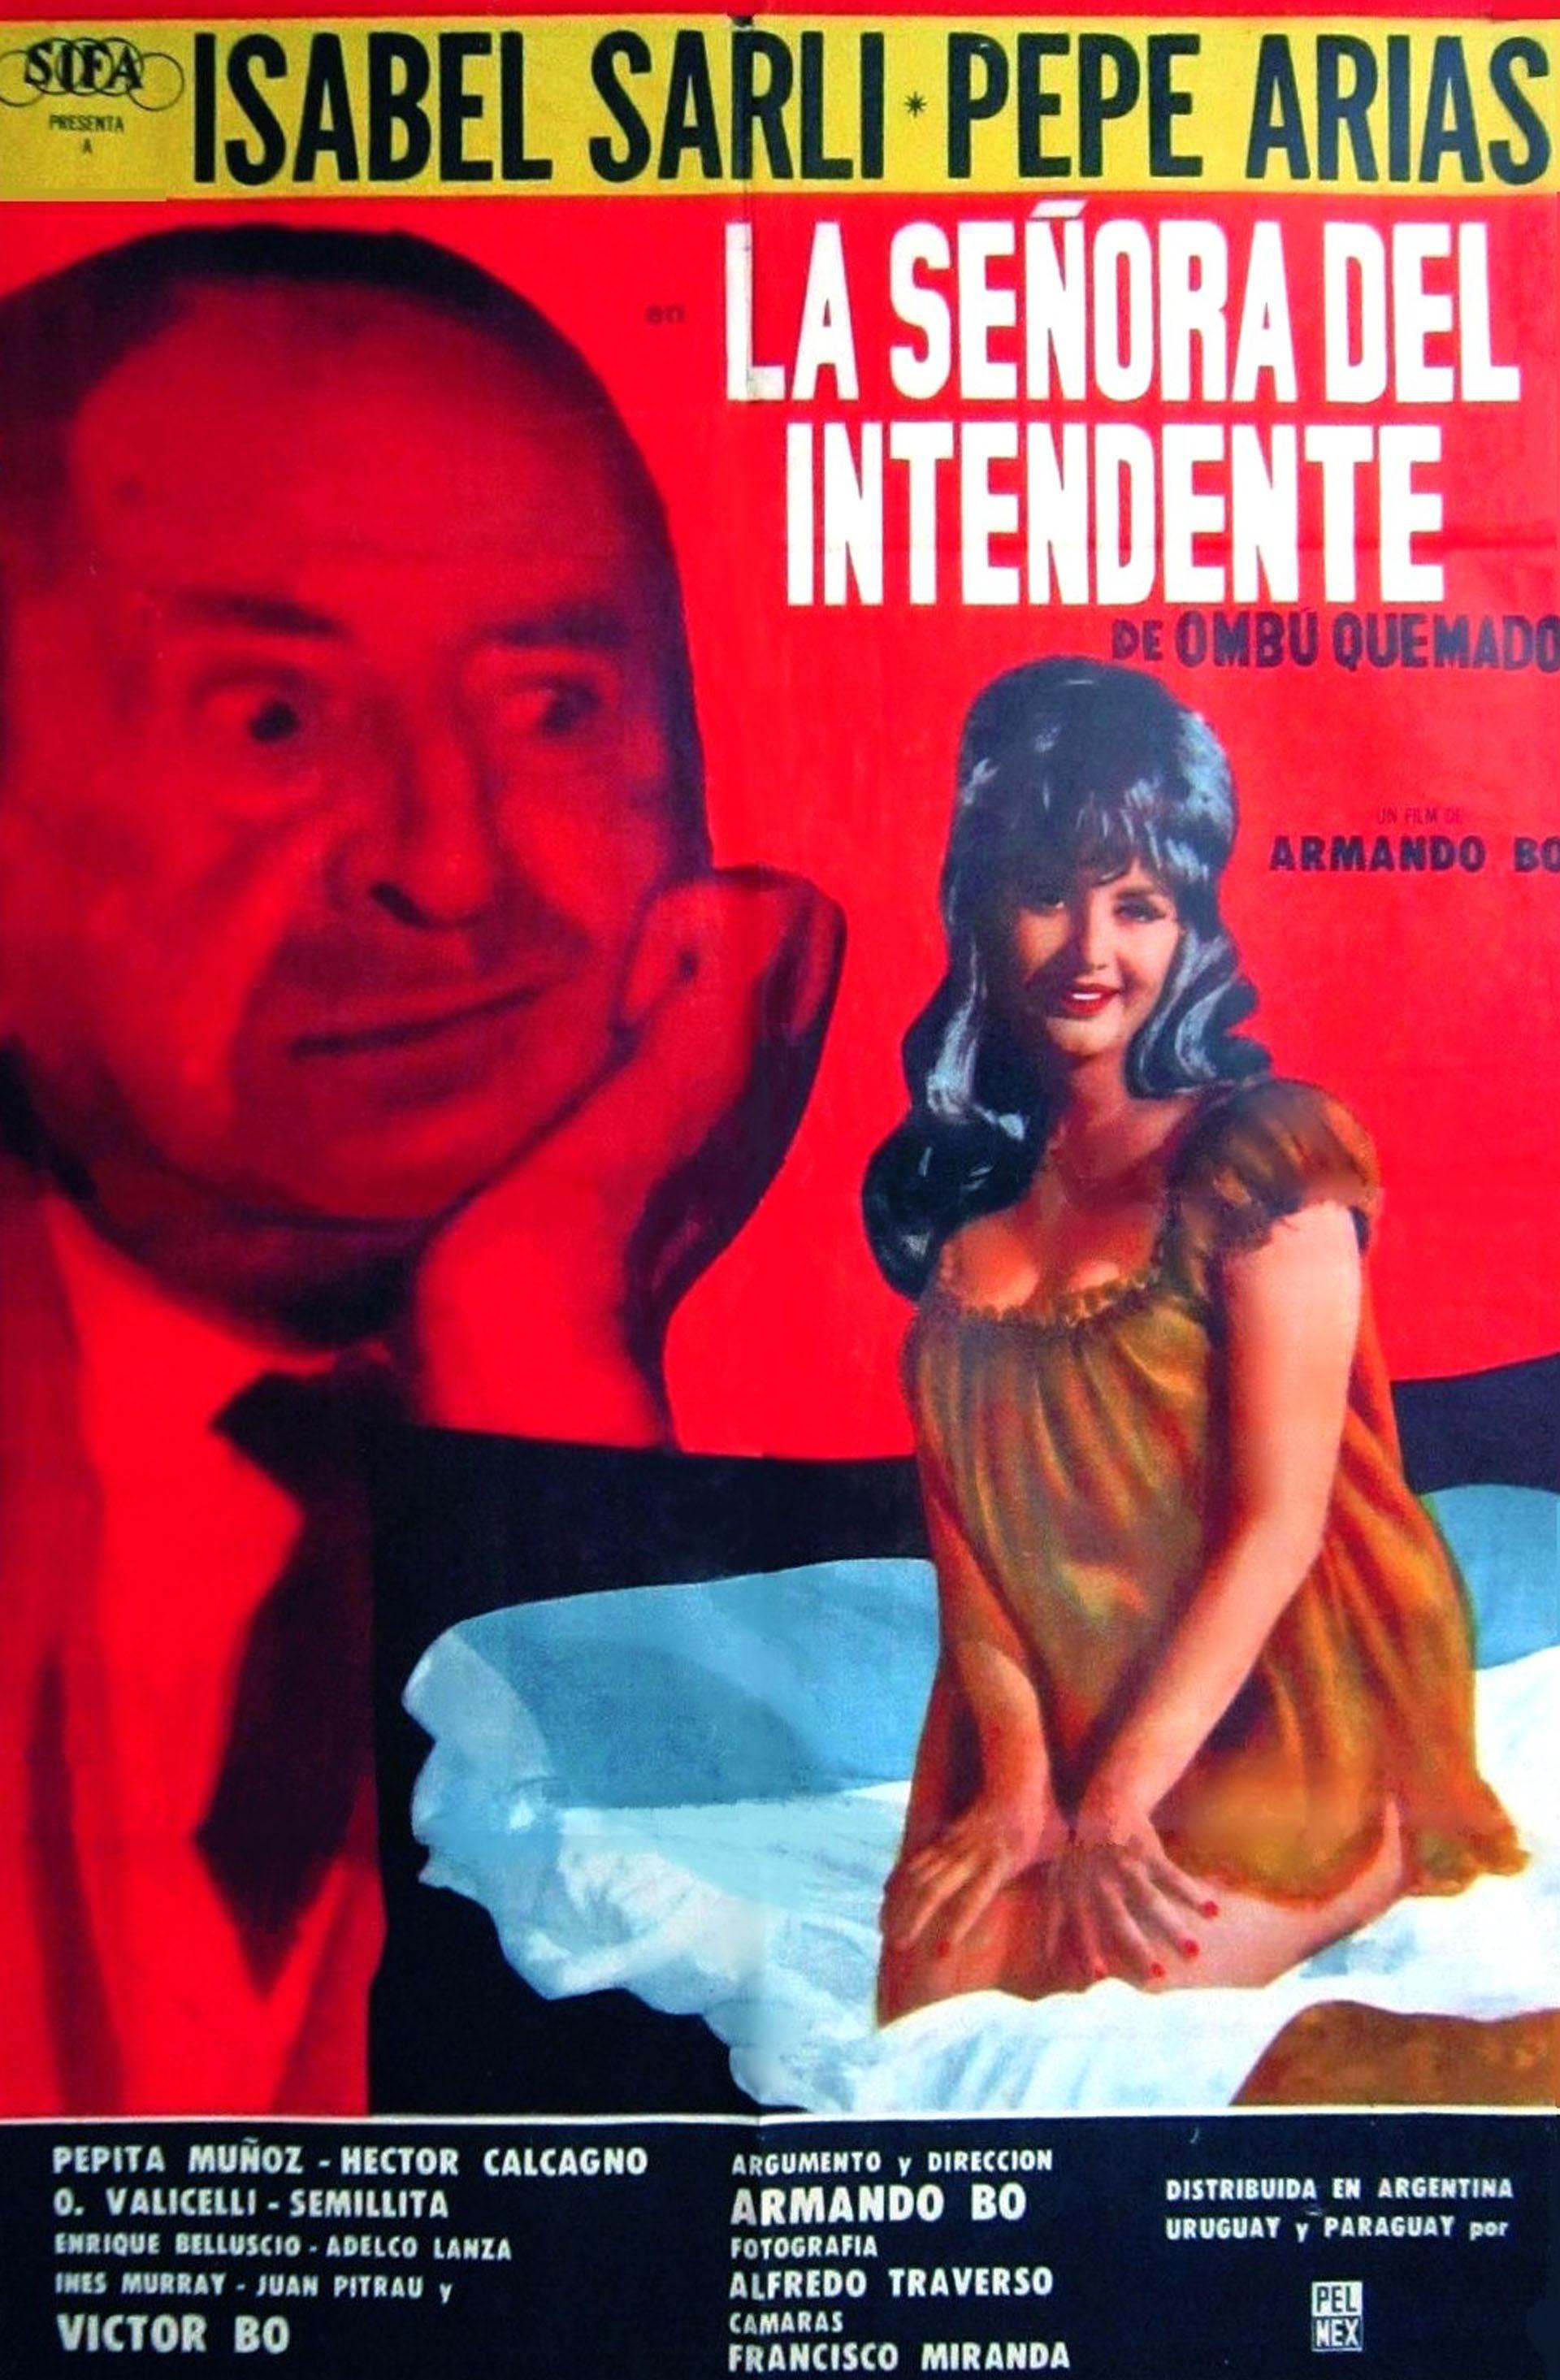 La señora del intendente se estrenó en 1967. La acompañó Pepe Arias, que murió un par de meses después del estreno